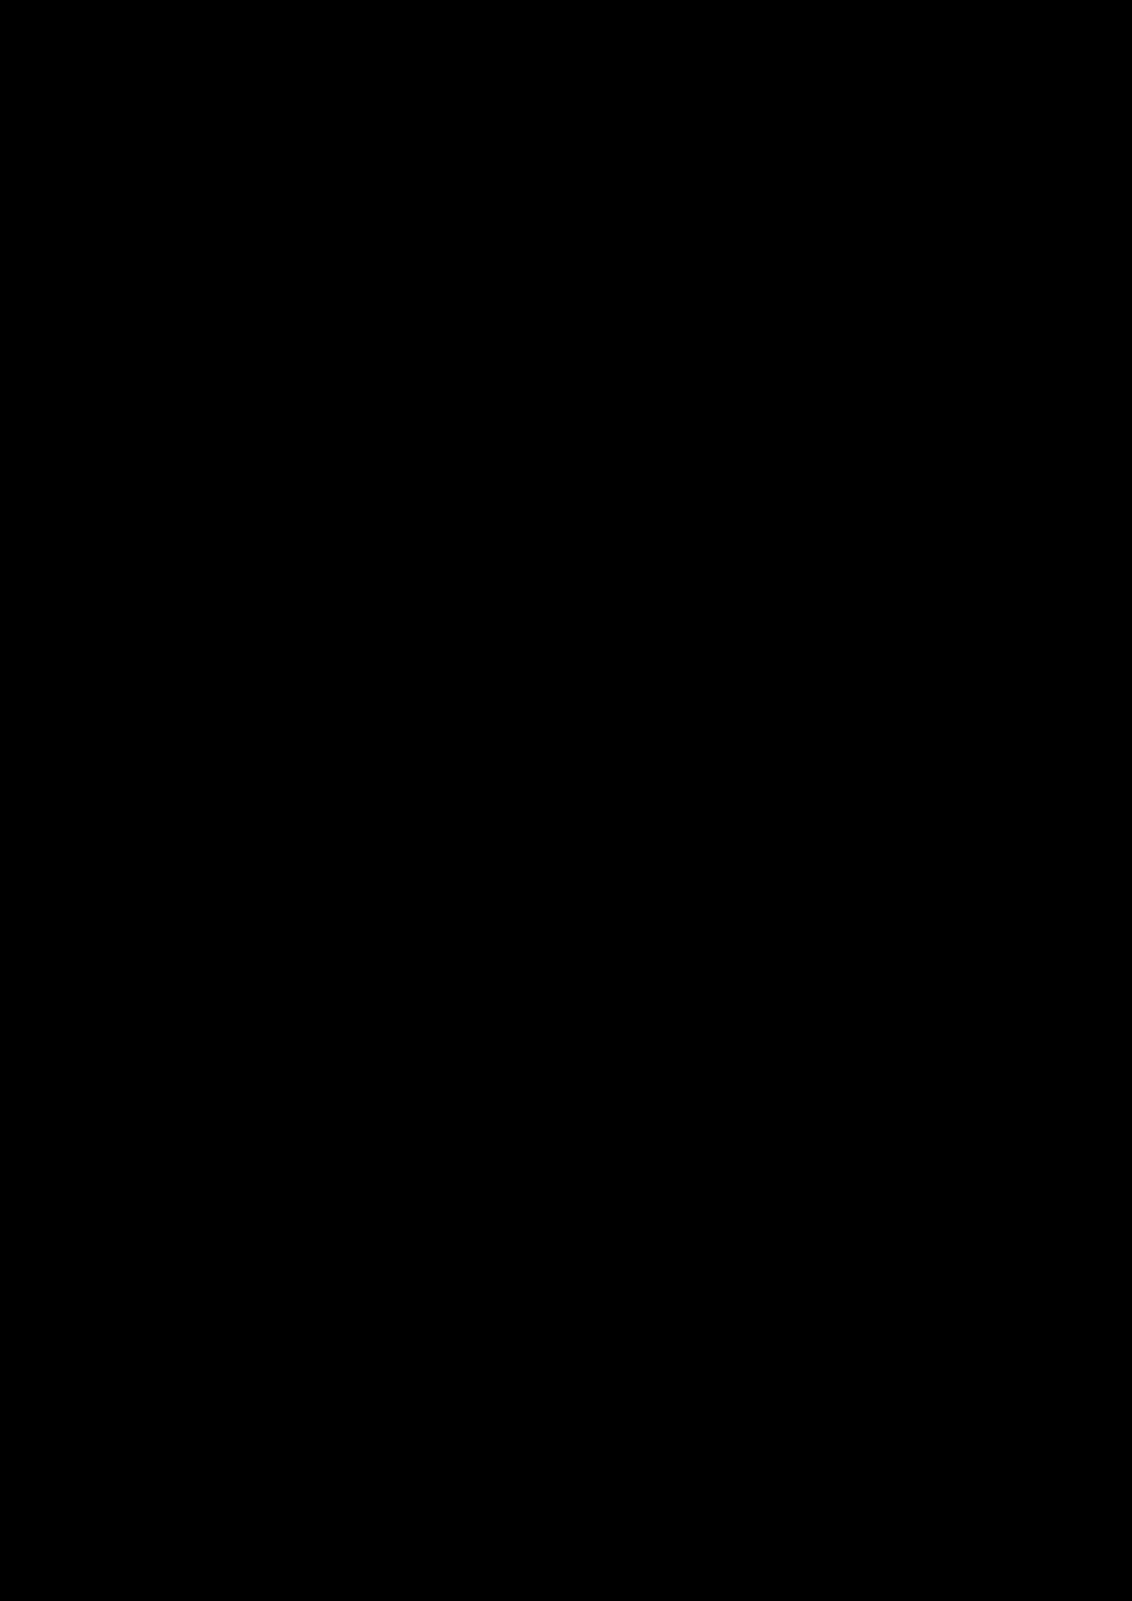 Belyiy sokol slide, Image 167